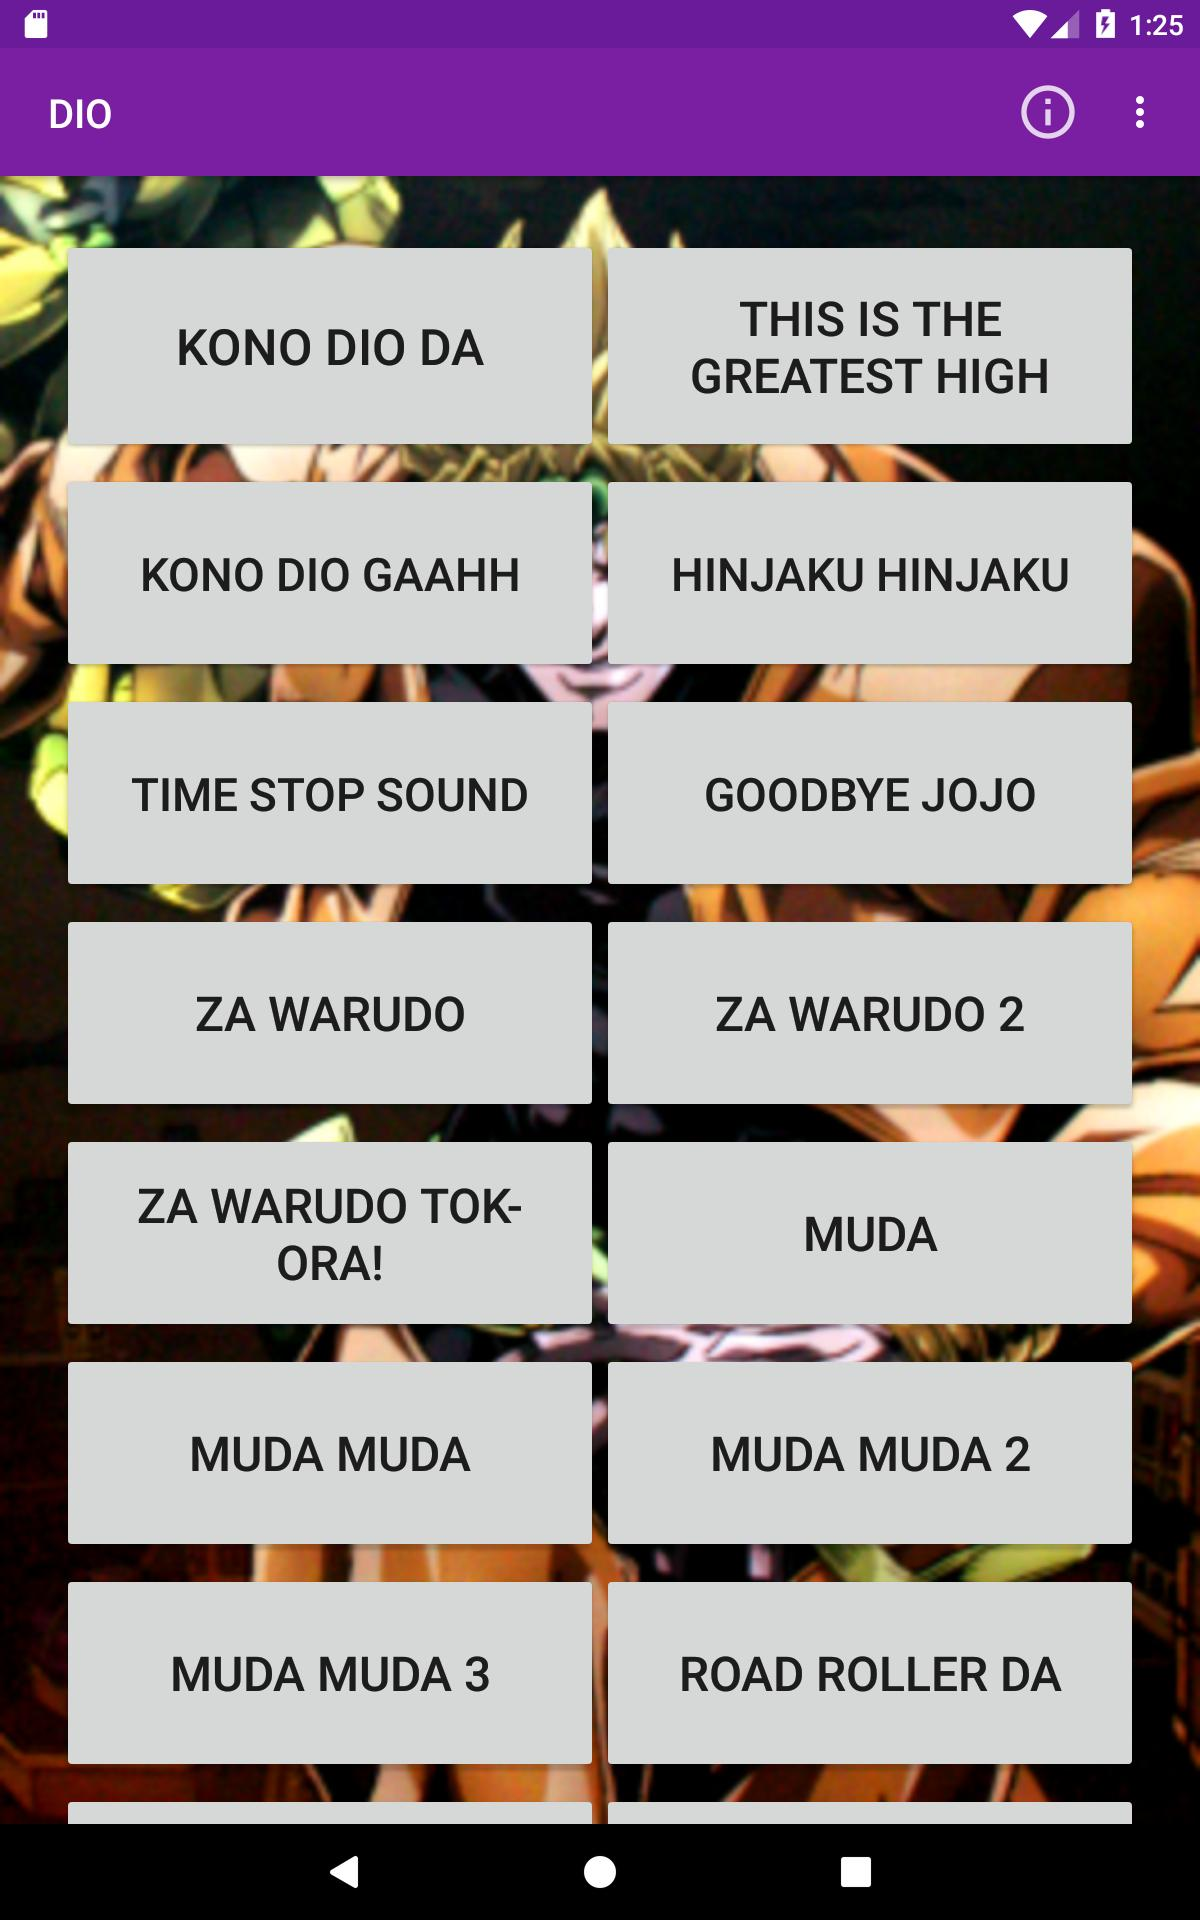 Jj Soundboard For Android Apk Download - download mp3 jojo bizarre adventure games youtube roblox